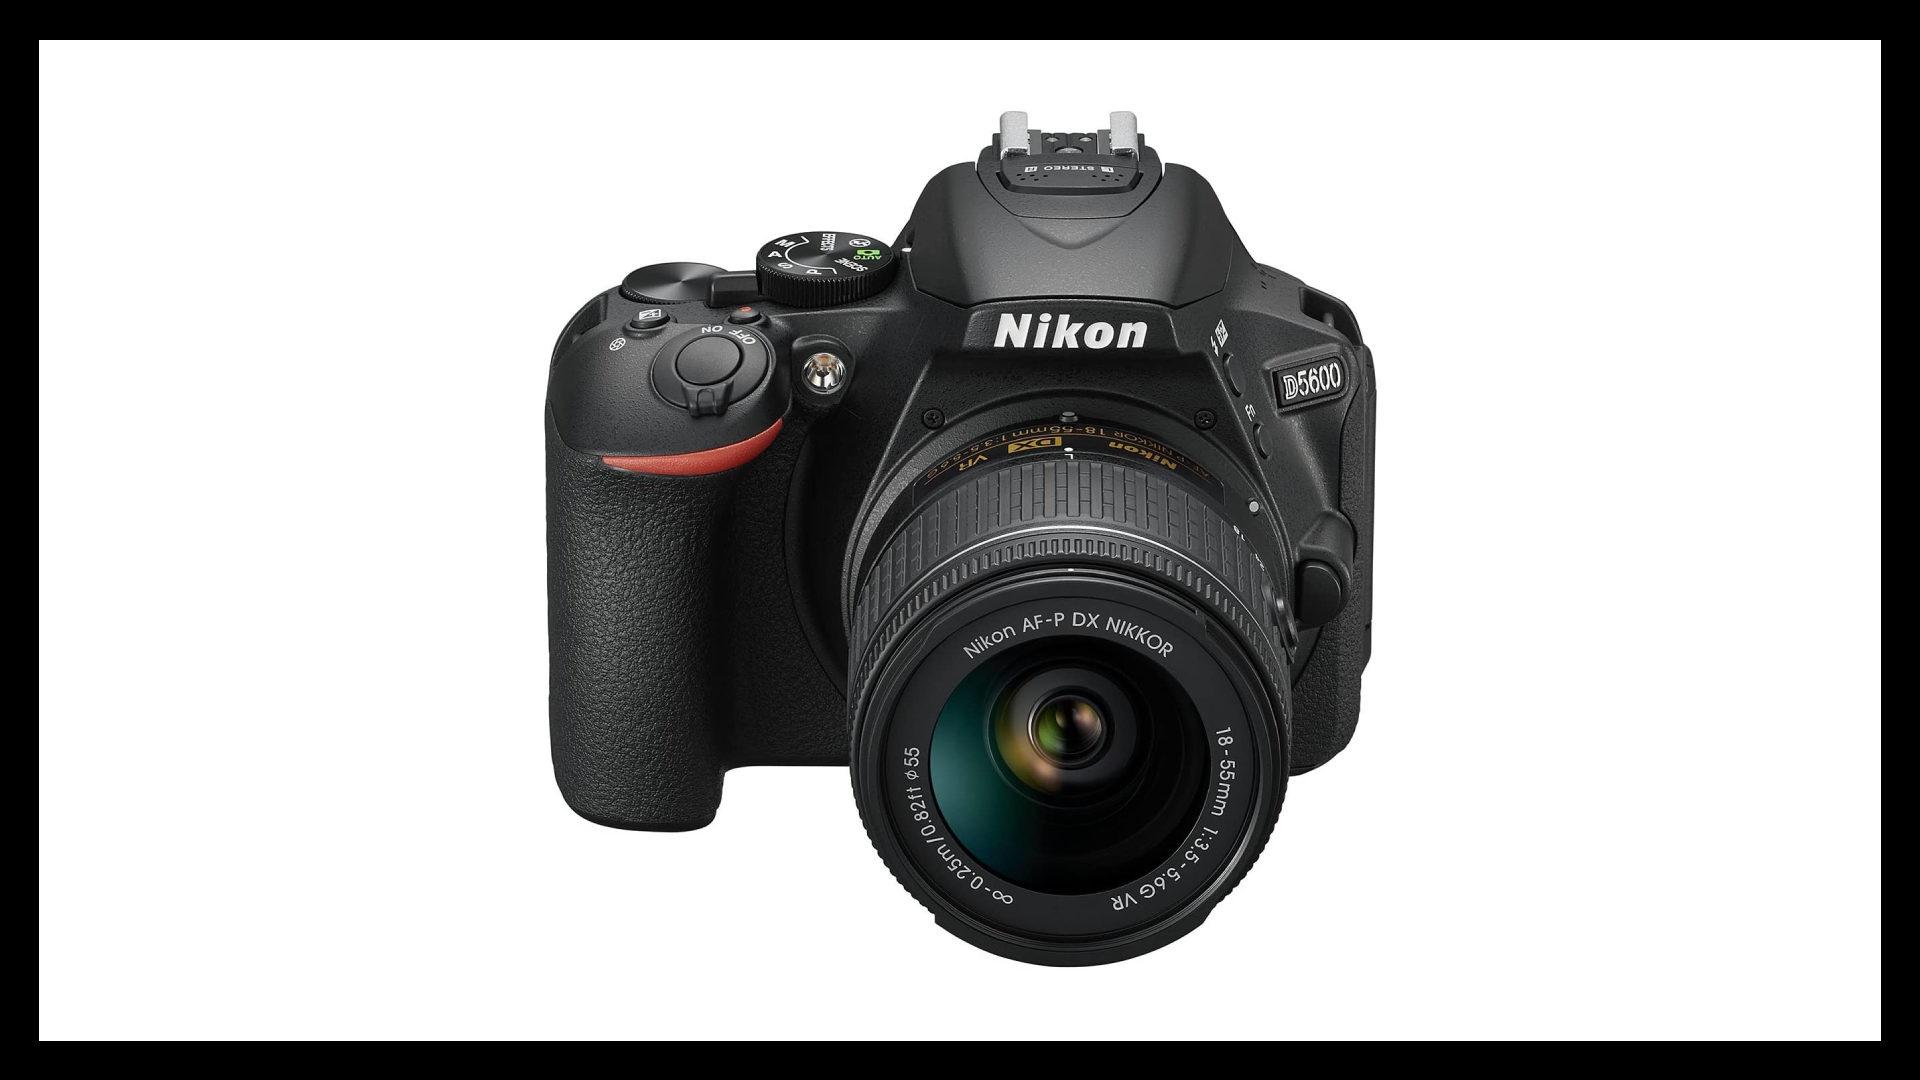 Nikon D5600 Best Vlogging Camera With Flip Screen